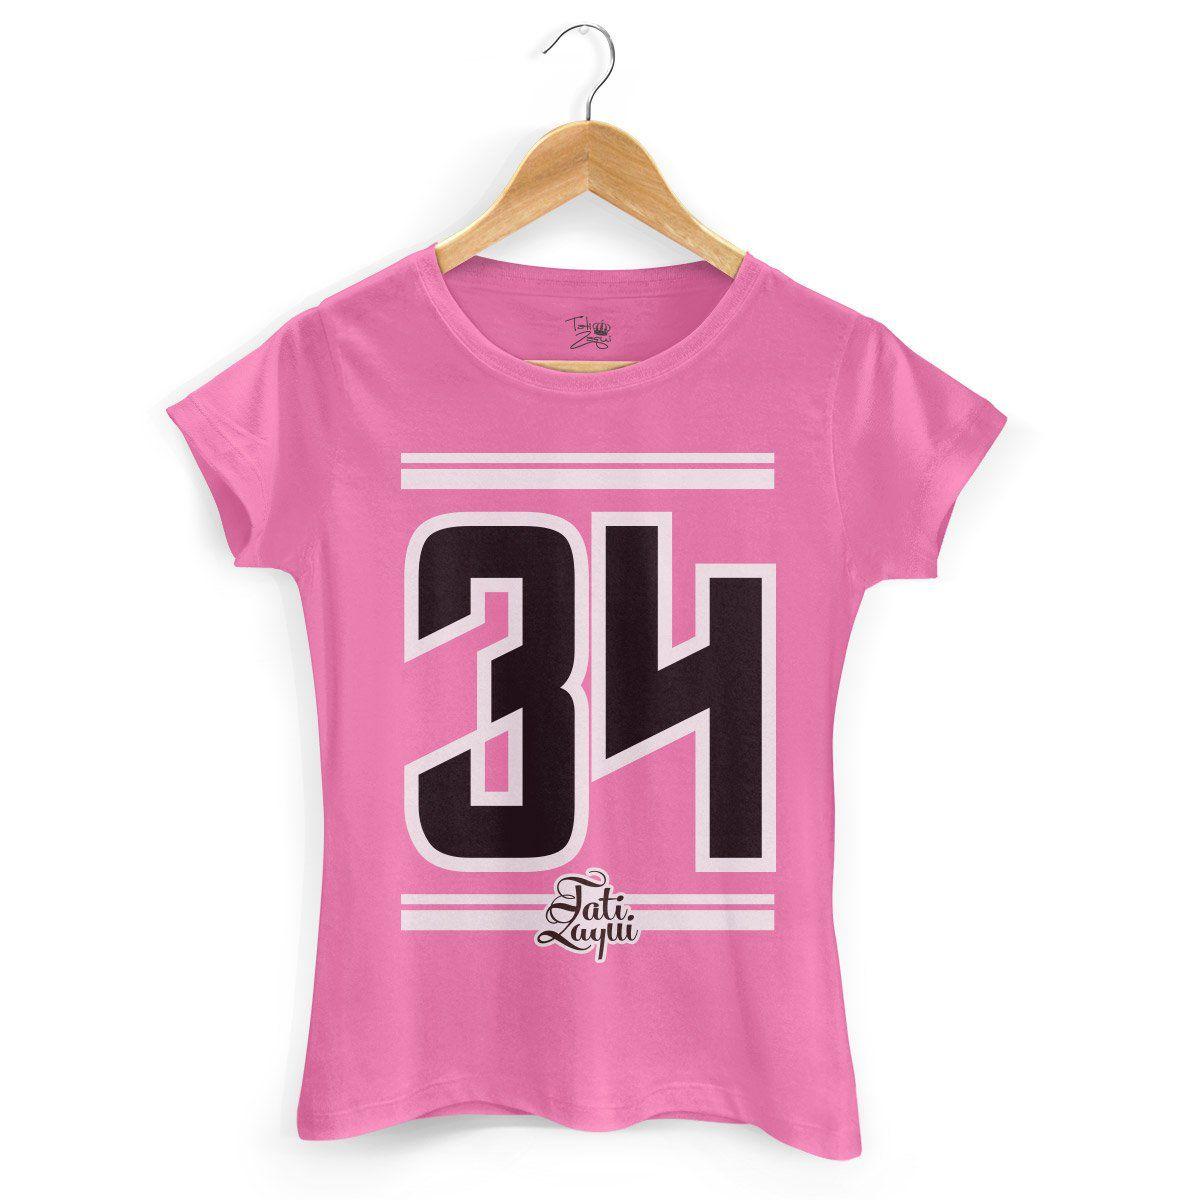 Camiseta Feminina MC Tati Zaqui 34  - bandUP Store Marketplace